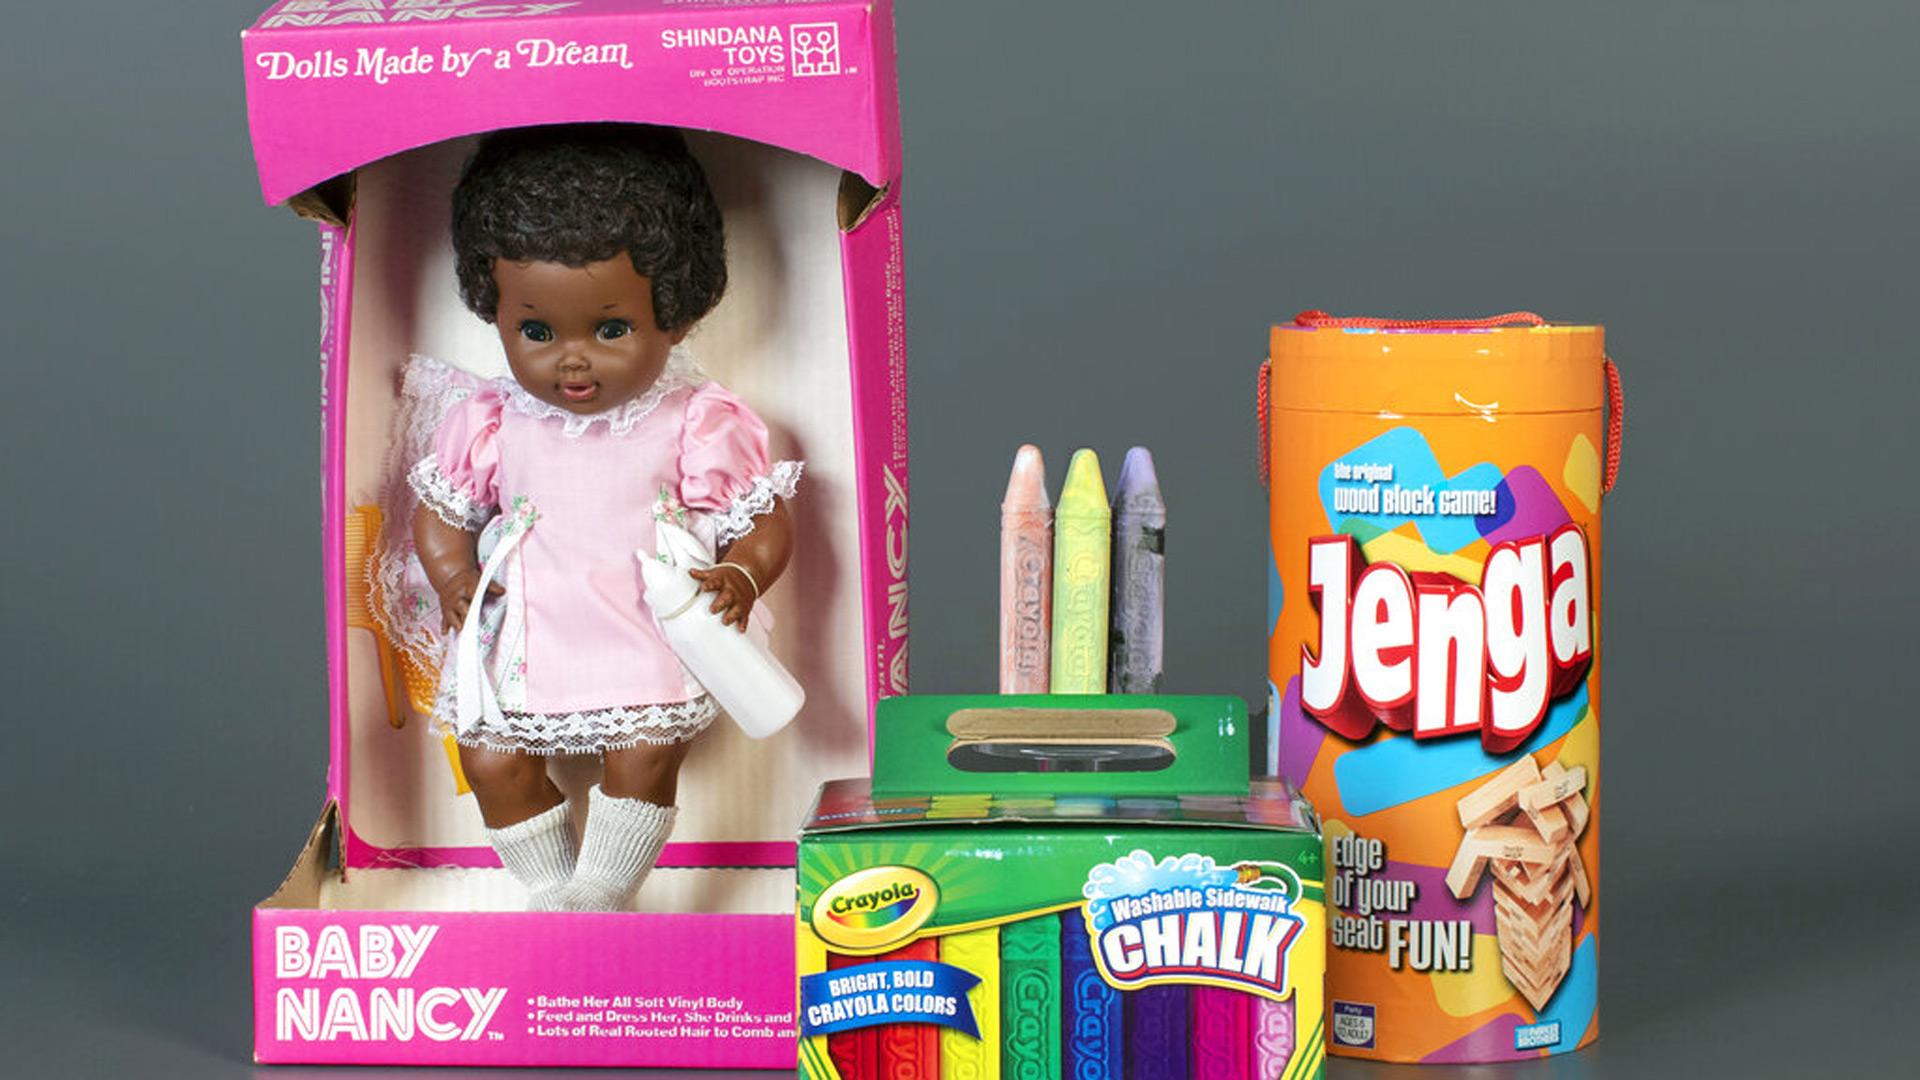 Baby Nancy doll